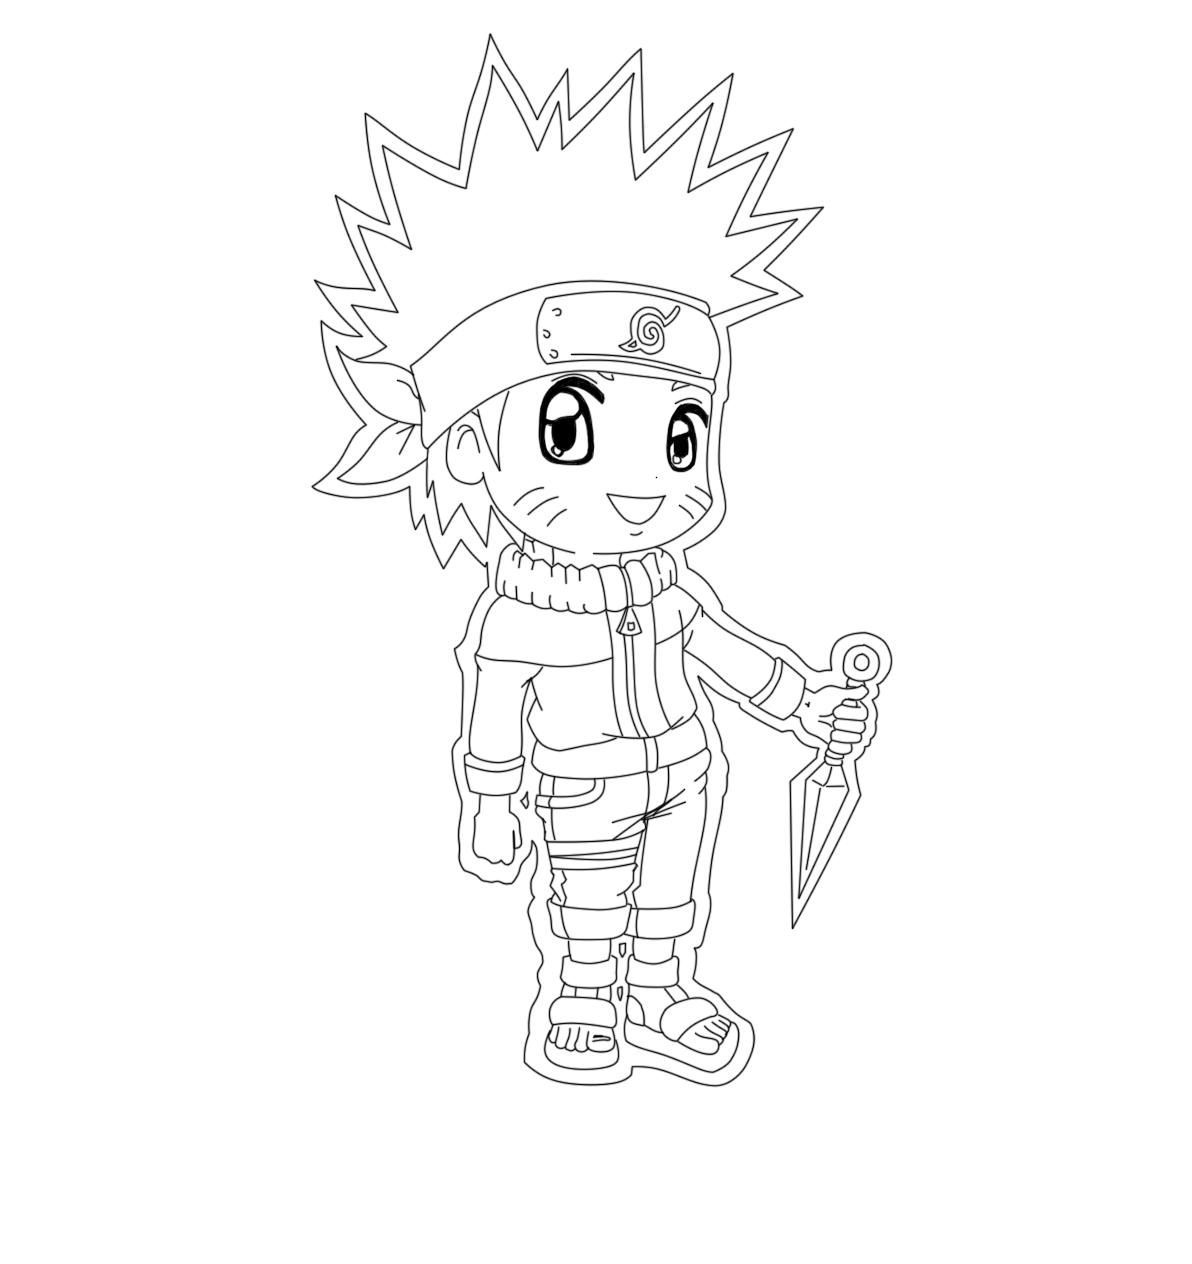 Dessin Naruto Kyubi Facile - Dessin Facile